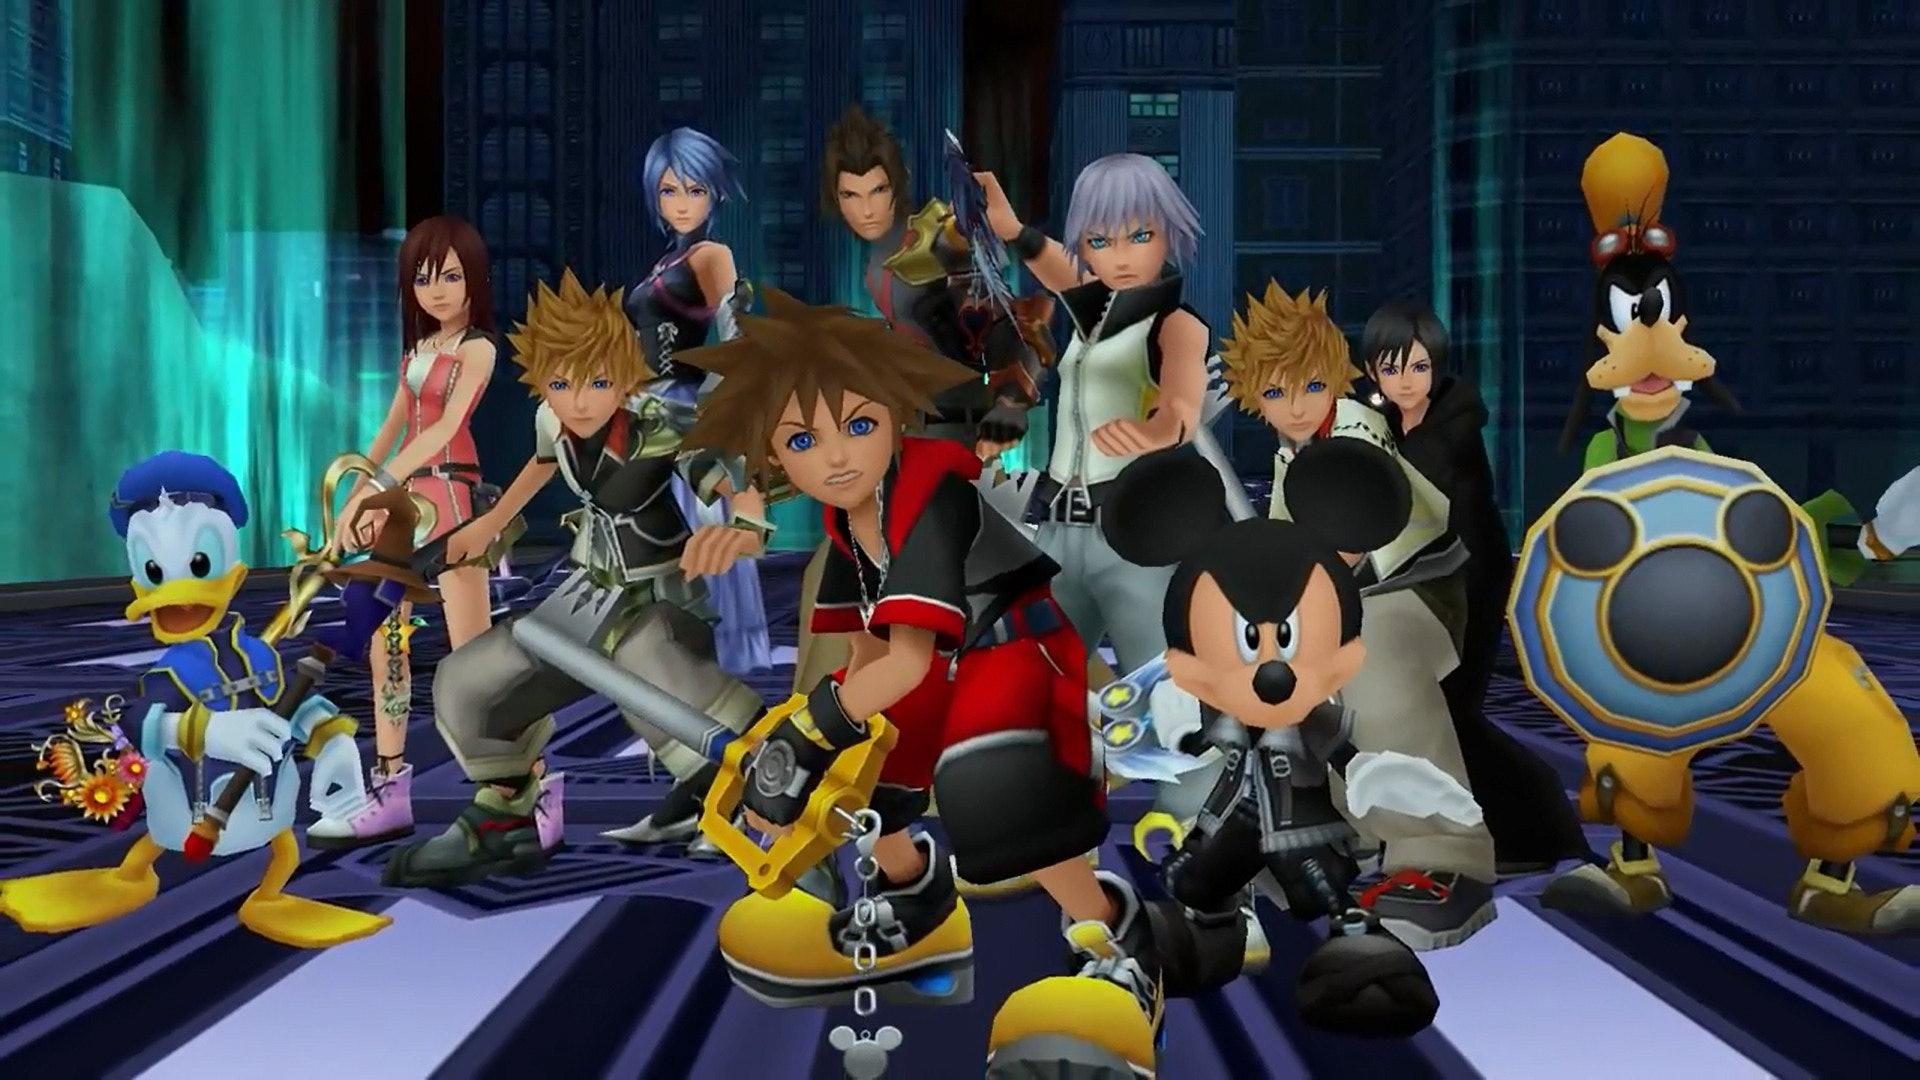 Kingdom Hearts 3 Plot Guide We Explain The Story So Far